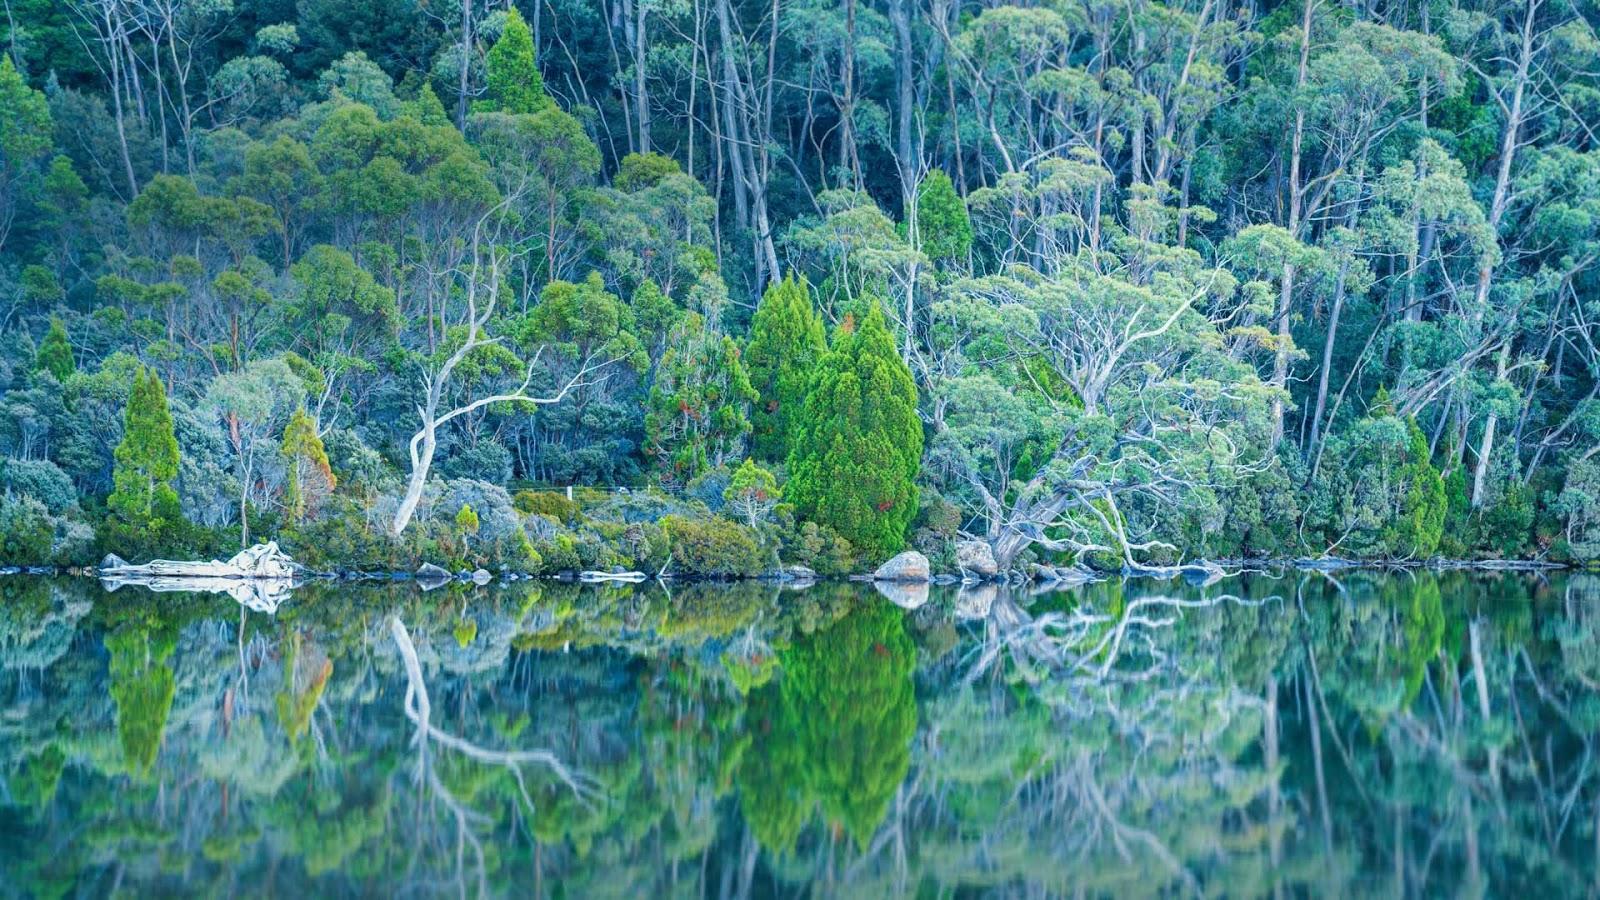 Lake Dobson in Mount Field National Park, Tasmania, Australia